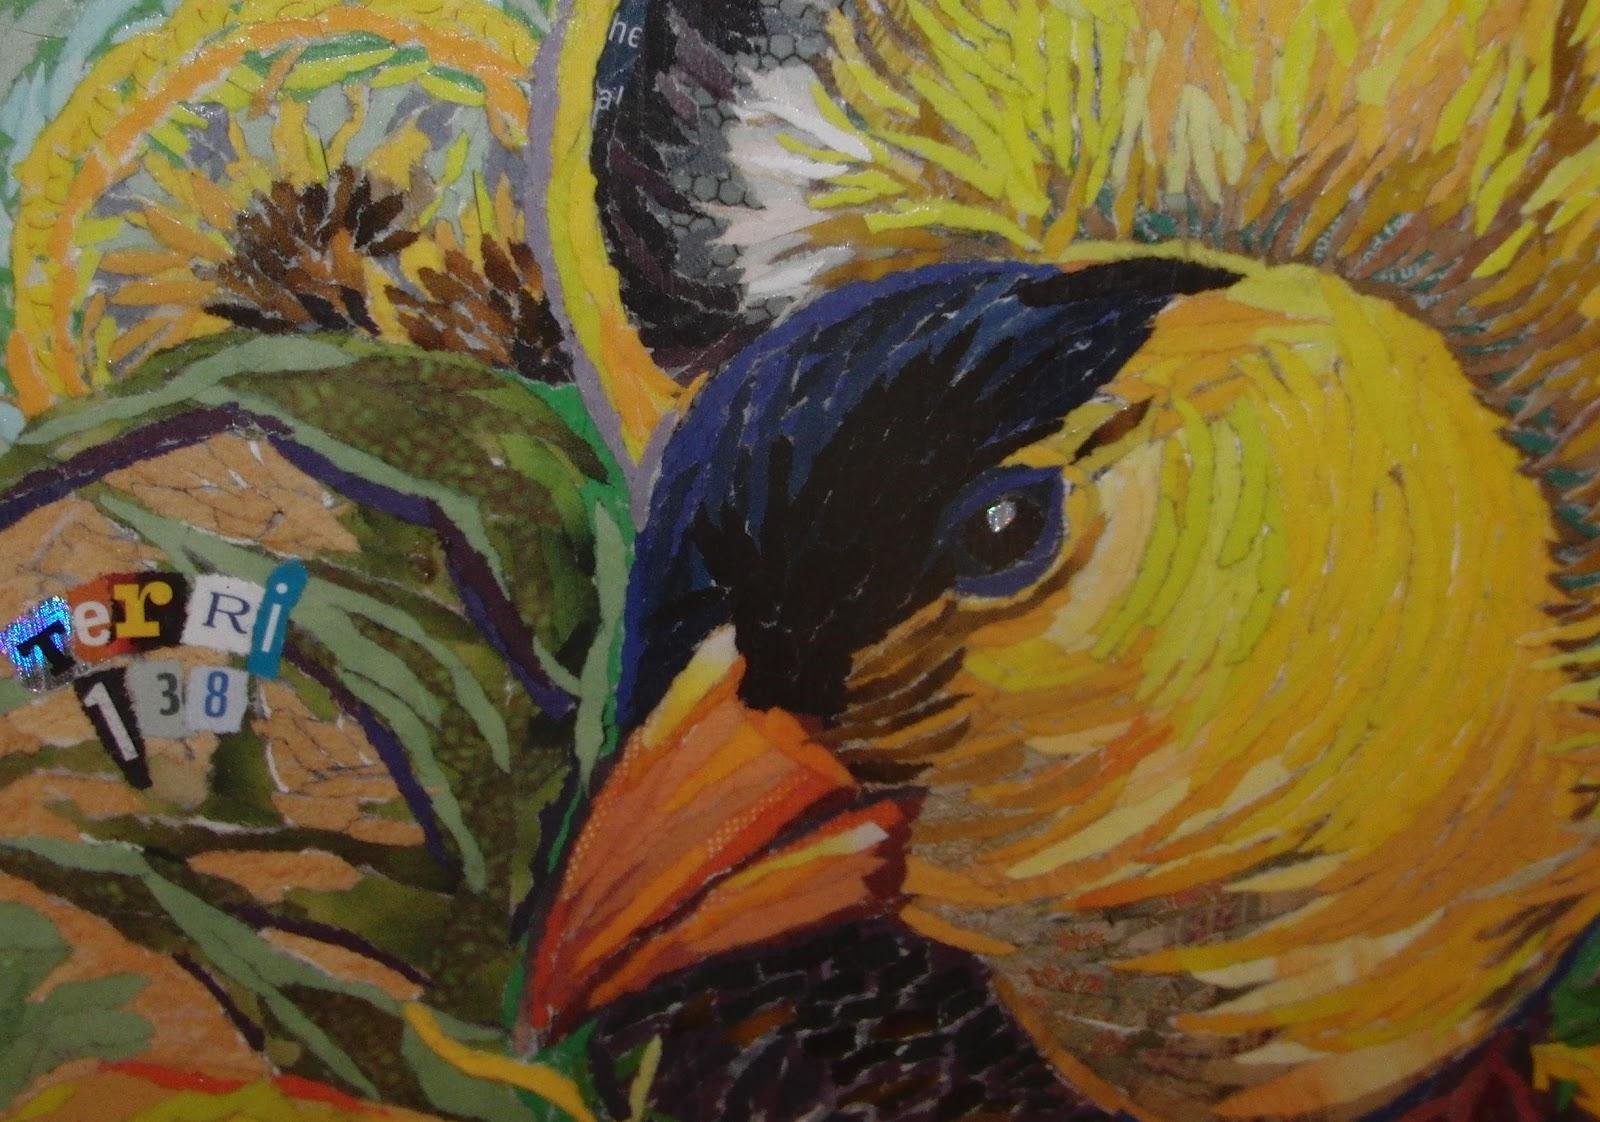 http://3.bp.blogspot.com/-P6TsQH9ZmO0/UIpw2mI_48I/AAAAAAAAAdc/7c5BhxqZUMU/s1600/Yellow+bird+detail2.jpg